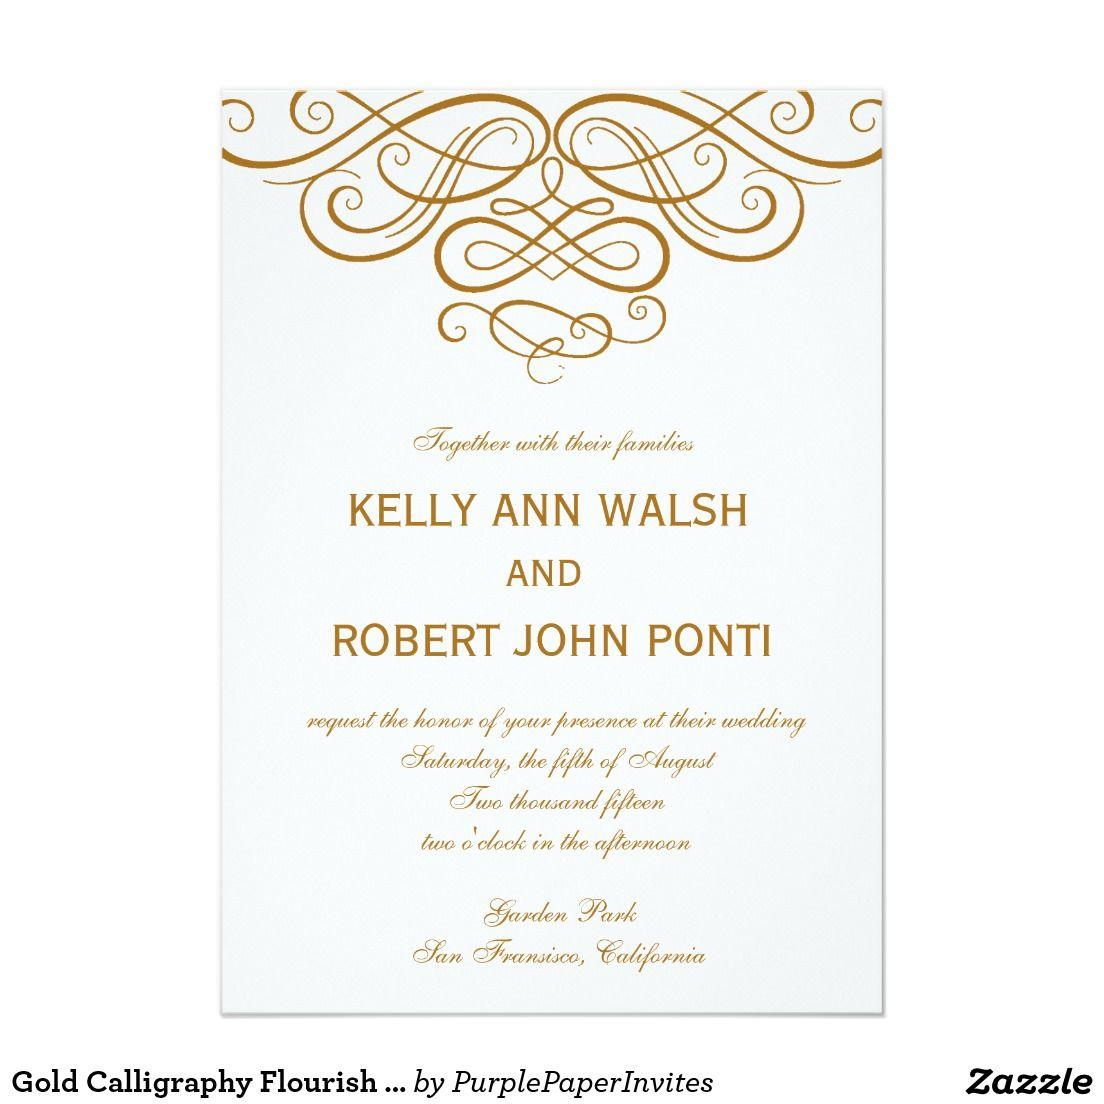 Gold Calligraphy Flourish Wedding Invitation | Gold calligraphy and ...